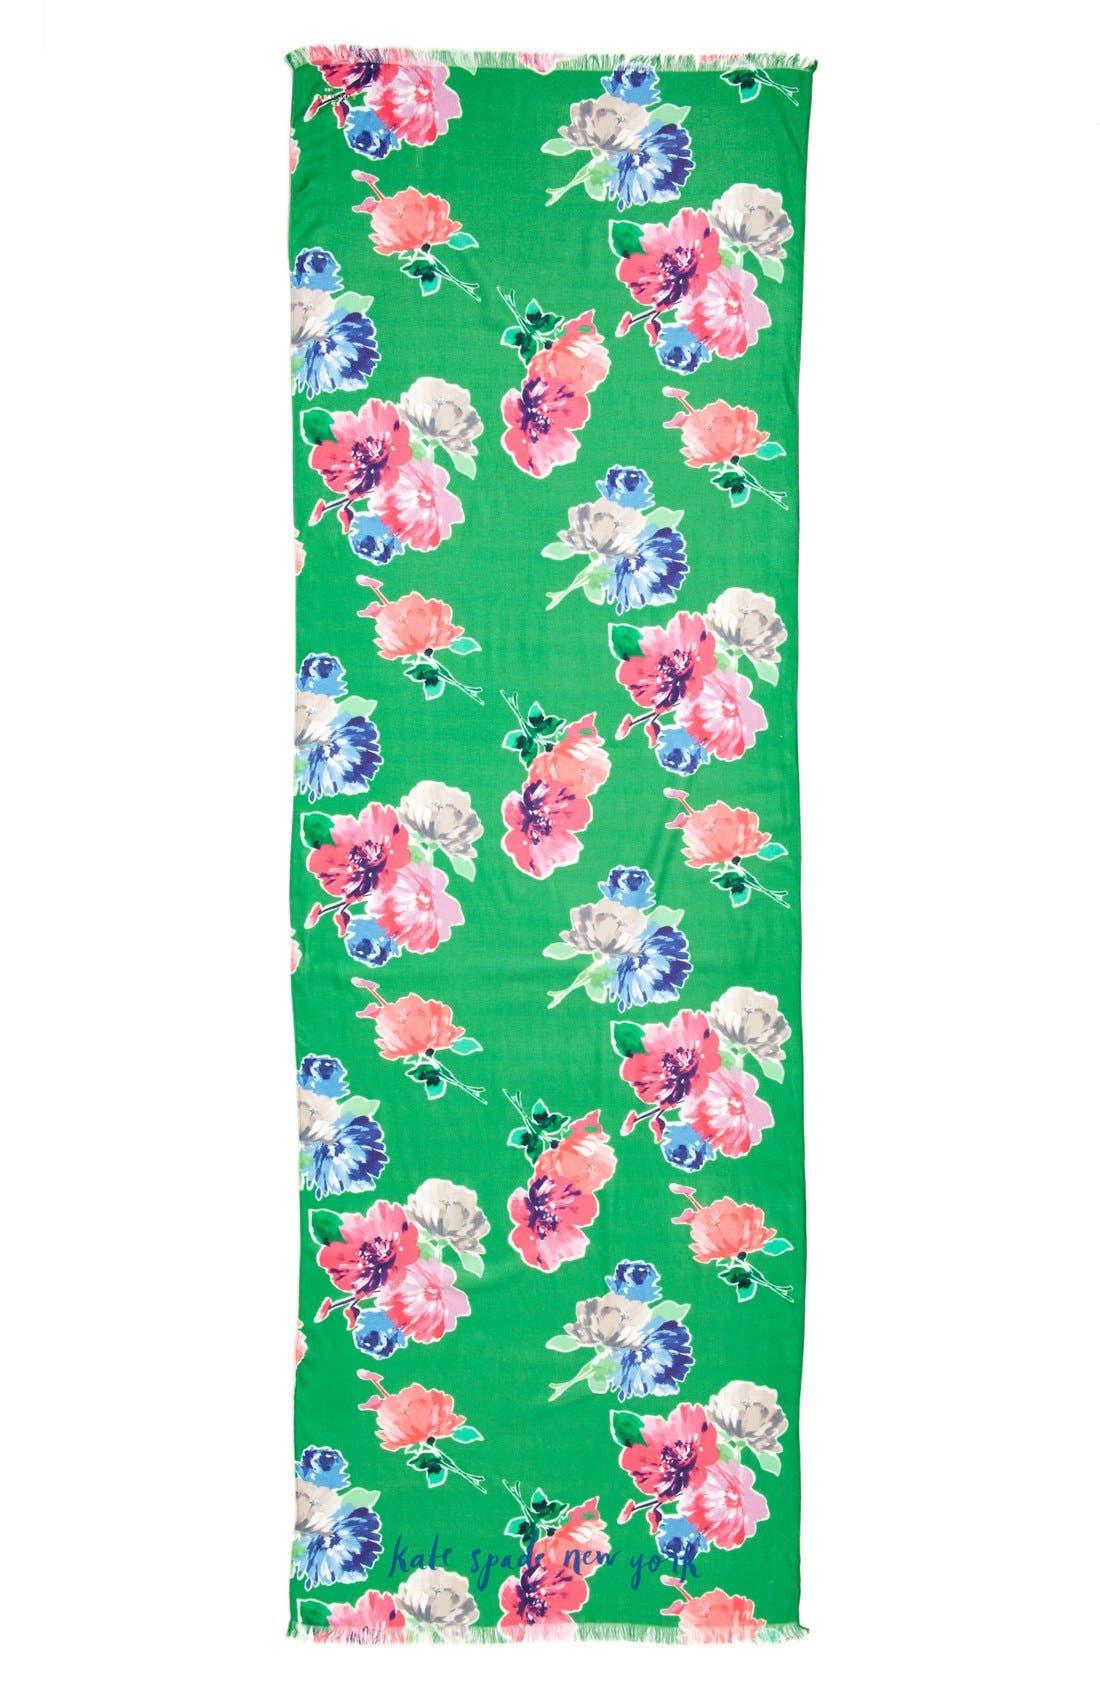 KATE SPADE NEW YORK,                             'spring blooms' scarf,                             Alternate thumbnail 2, color,                             300